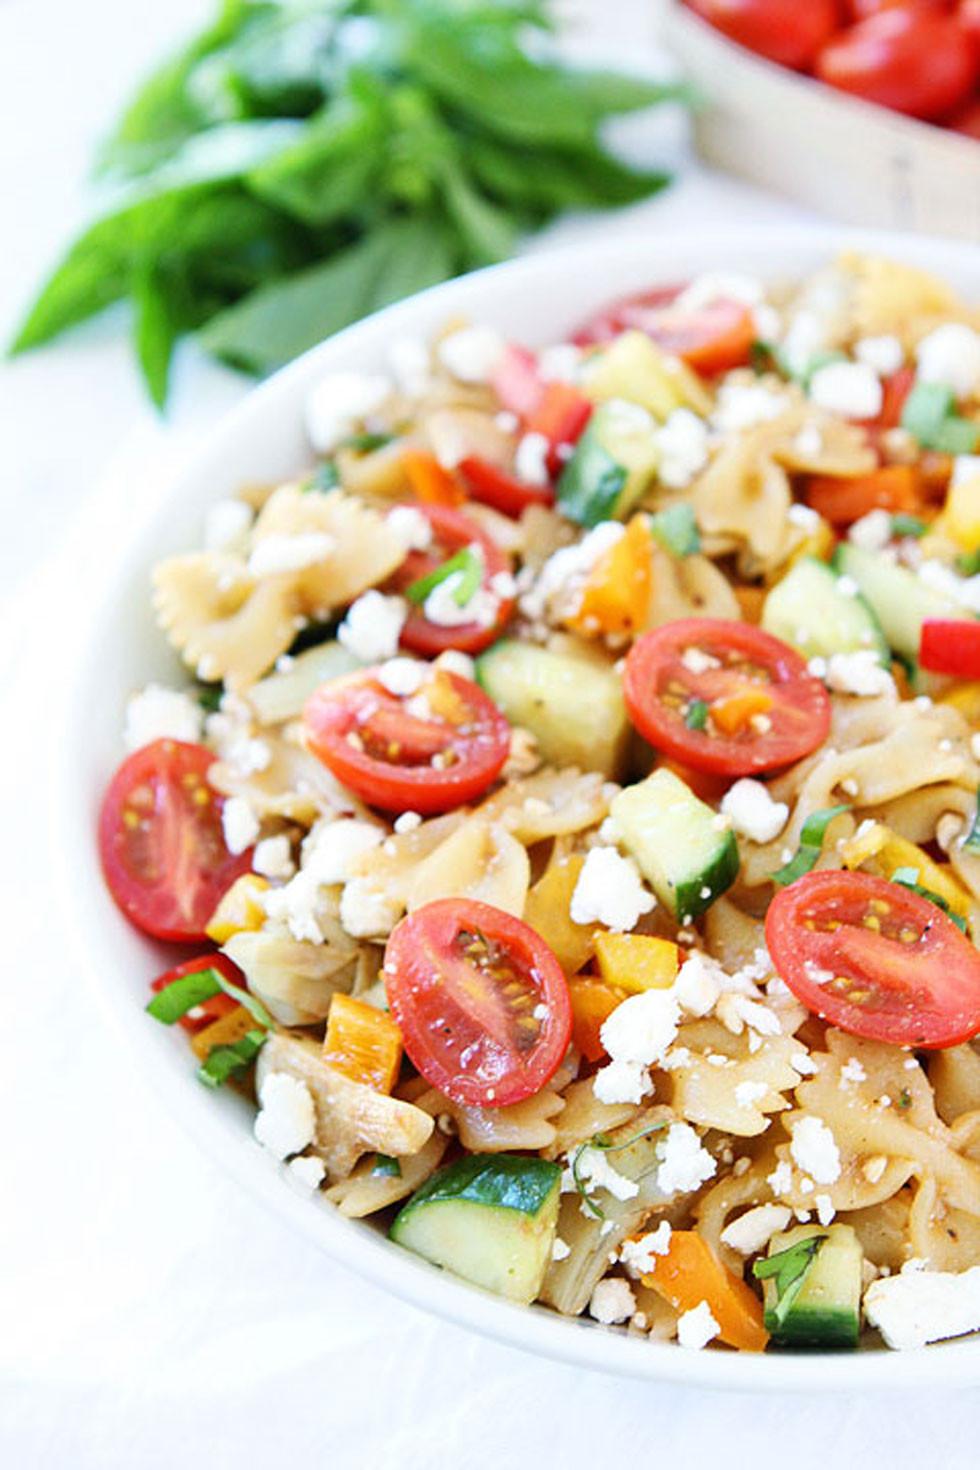 Summer Main Dishes  Easy main dish summer salad recipes Food easy recipes